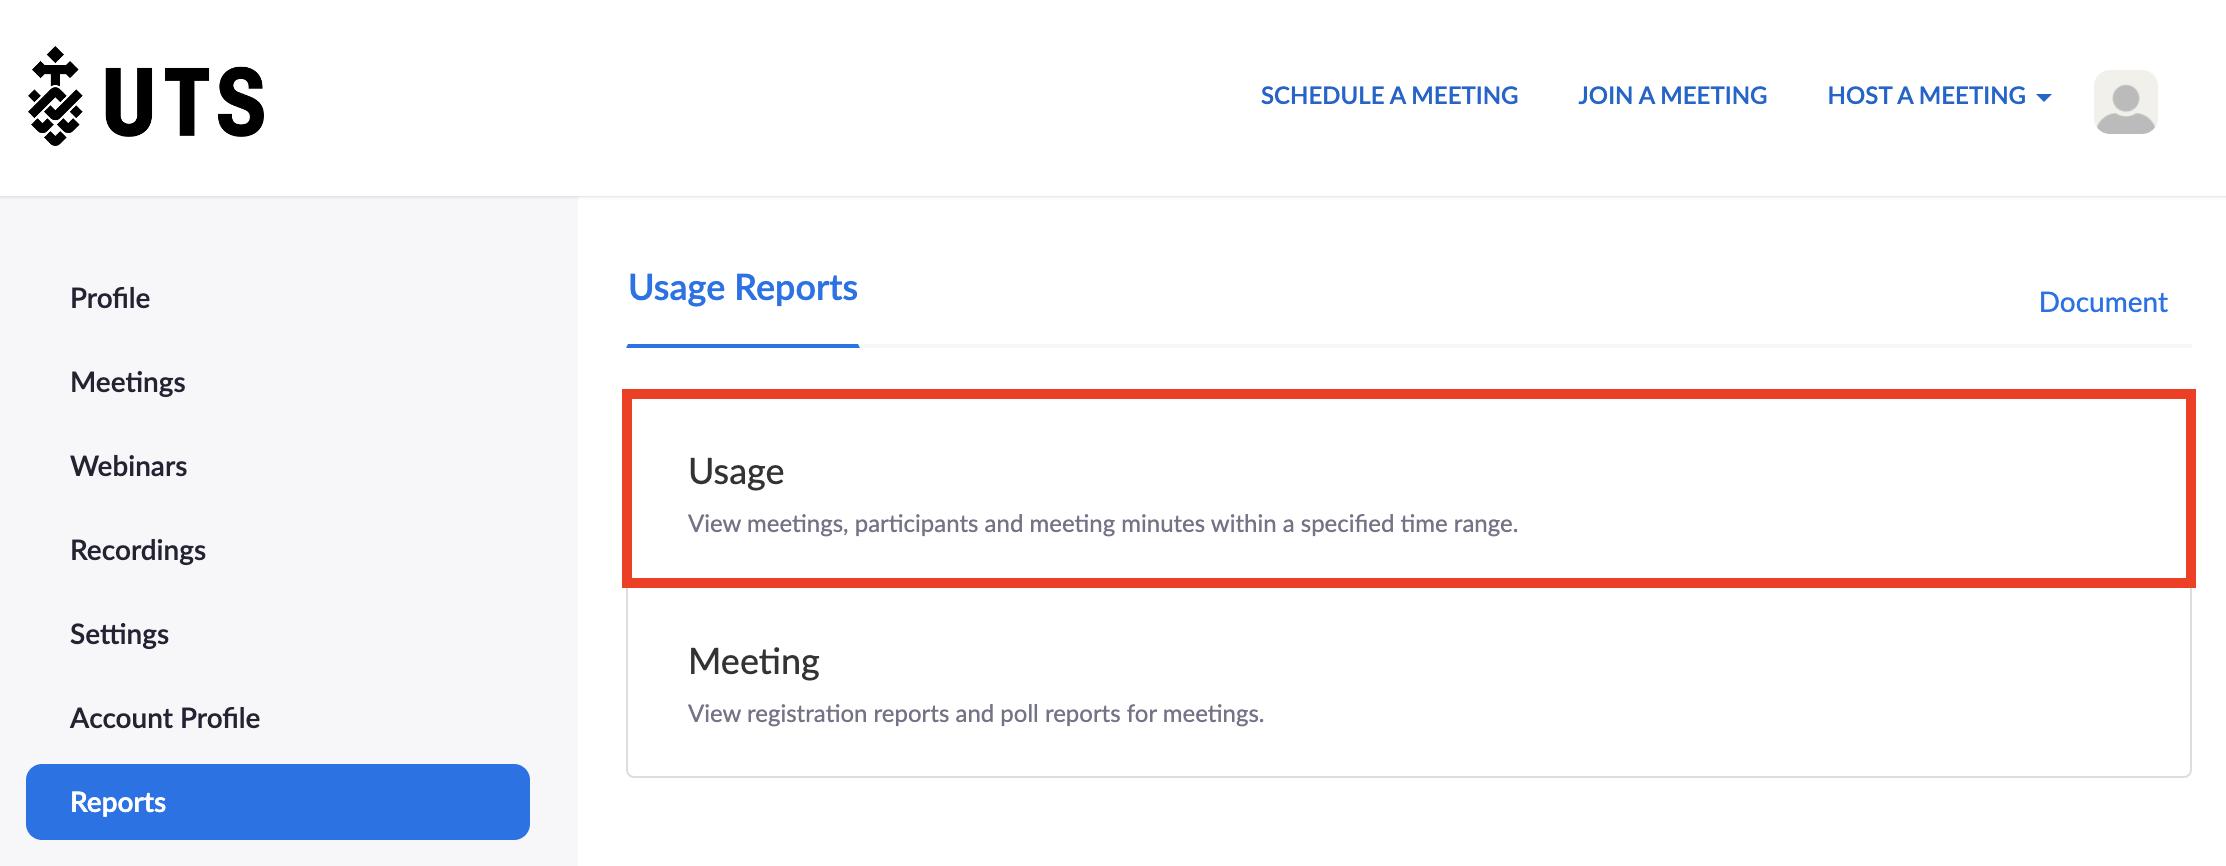 Screenshot of Zoom 'Reports' tab displaying 'Usage' option